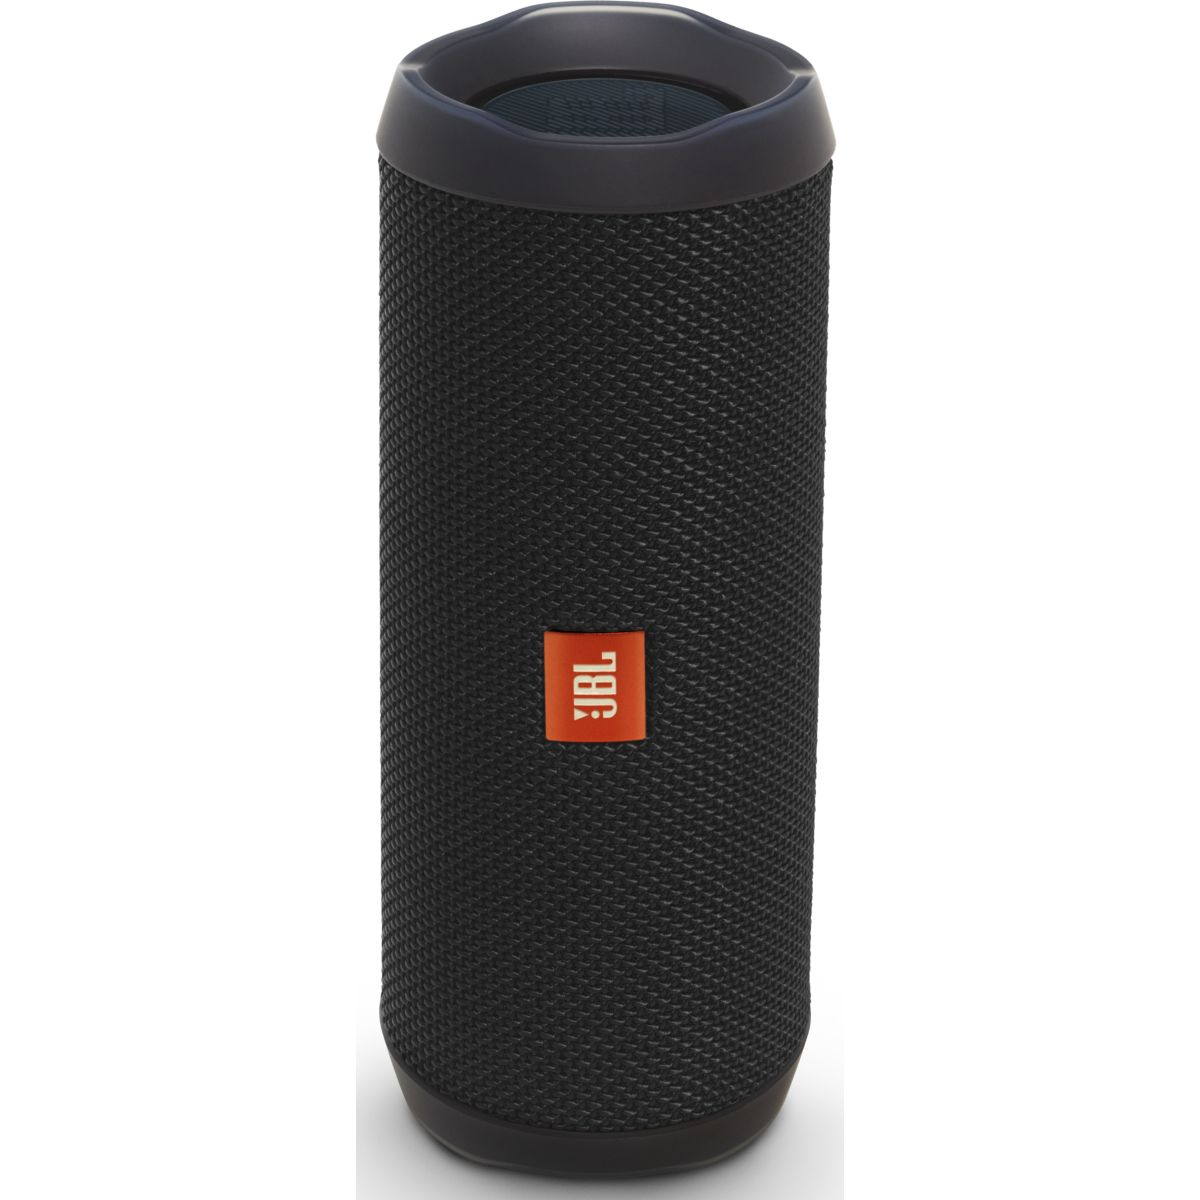 Enceinte Bluetooth JBL Flip 4 Noir